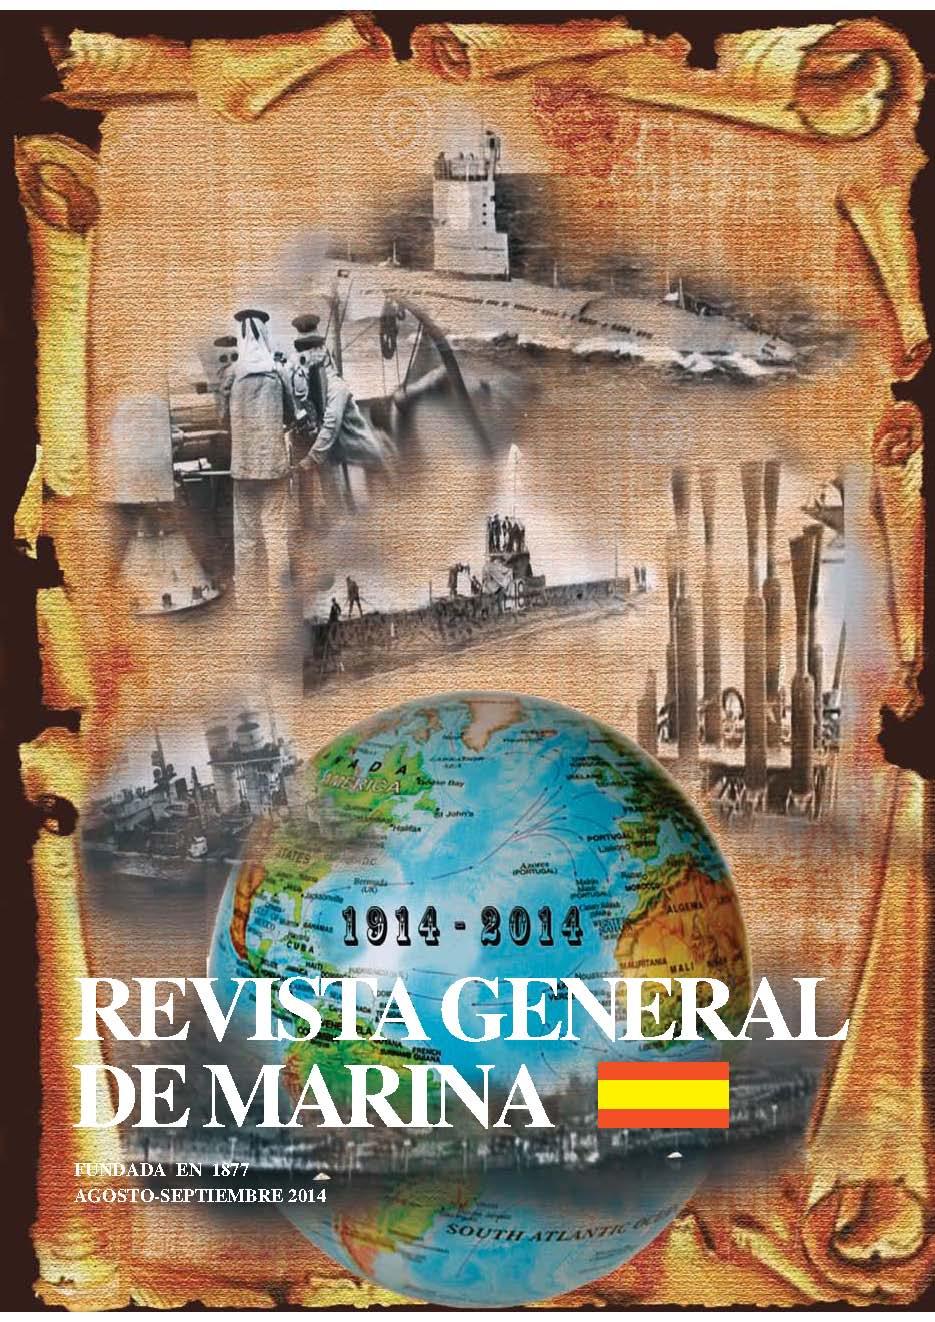 Revista General de Marina Agosto/Septiembre 2014